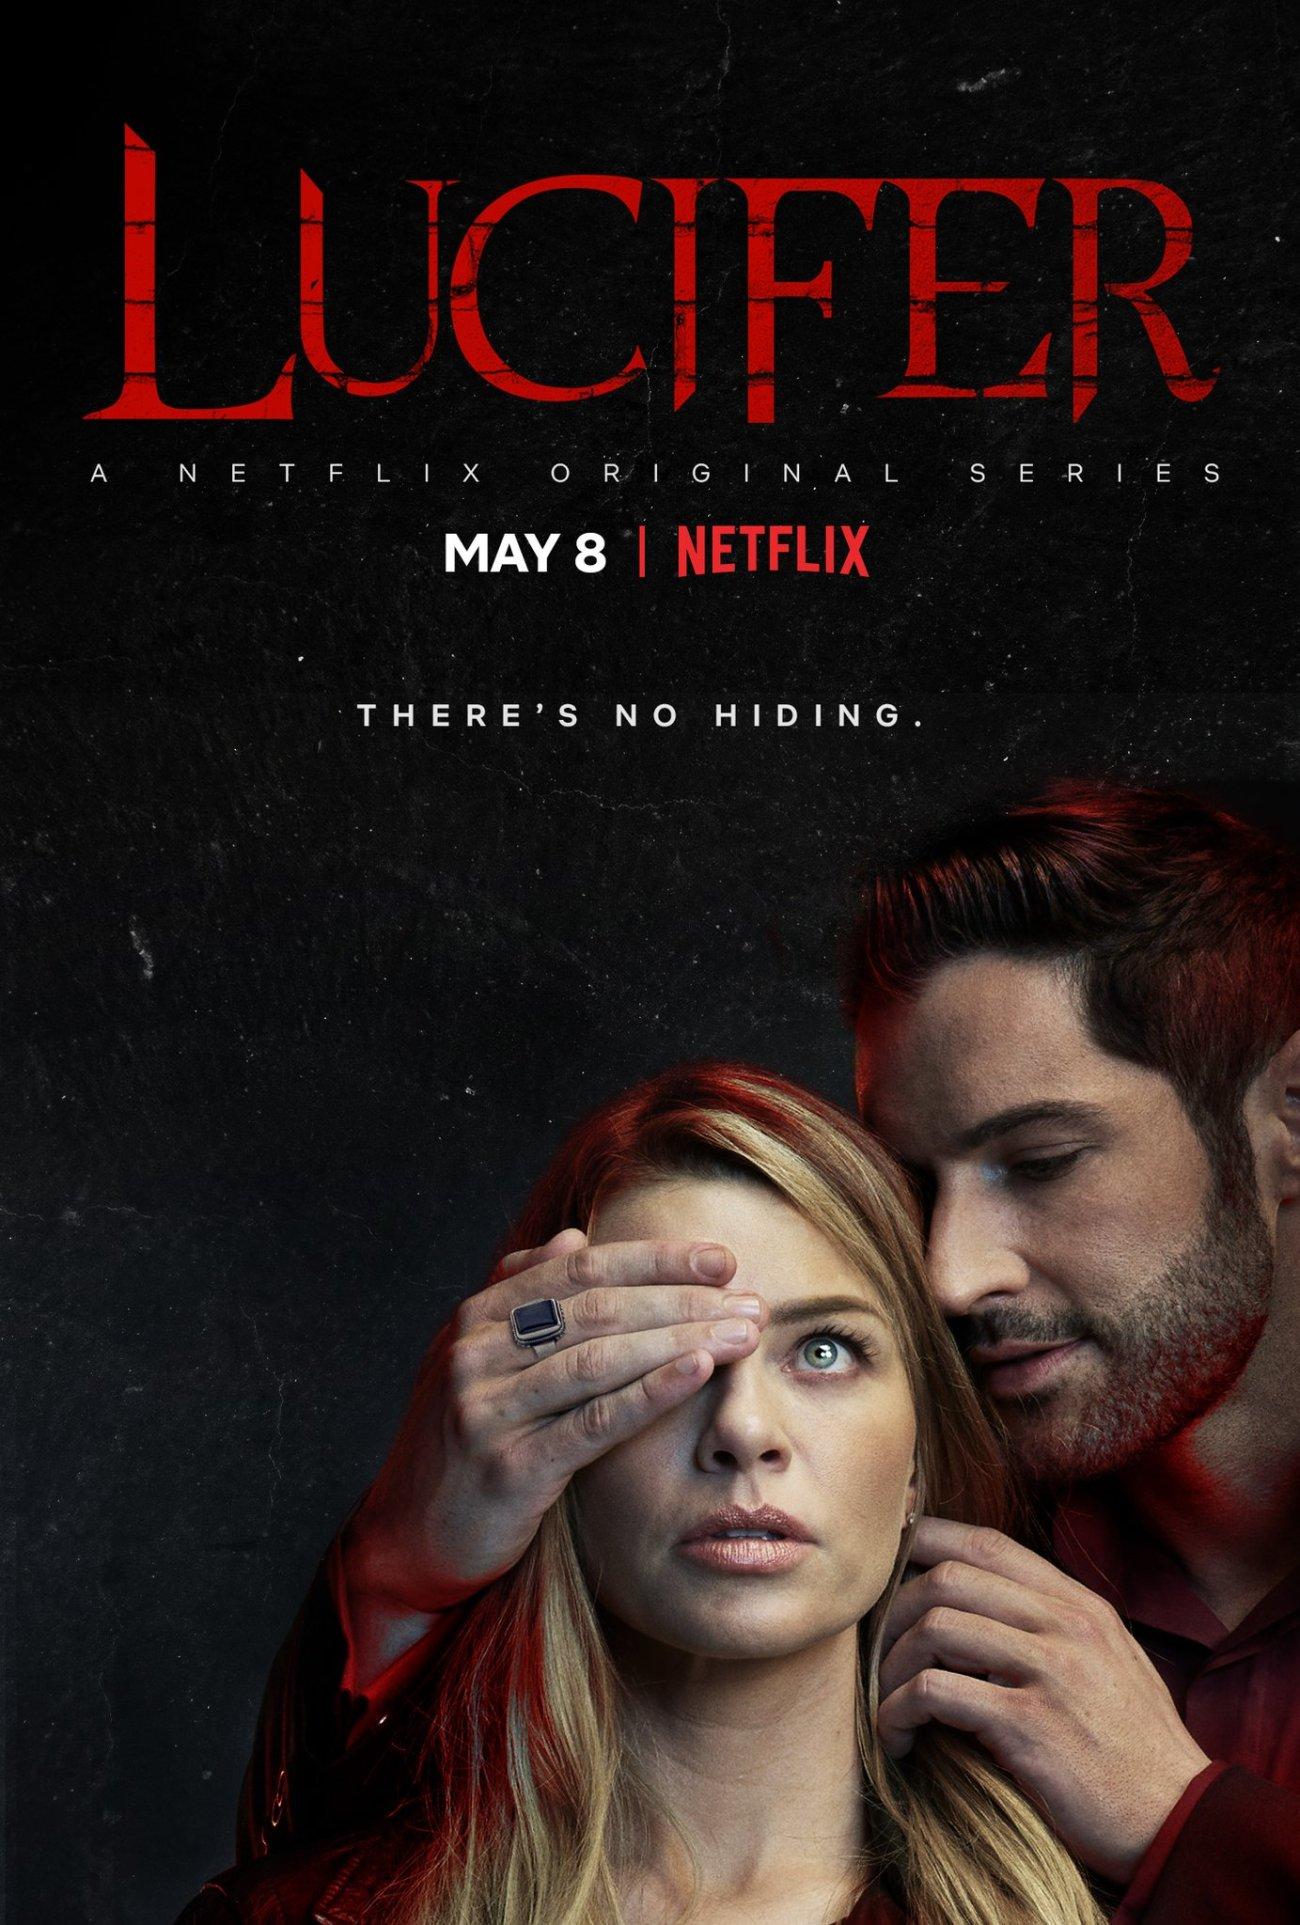 Póster de la temporada 4 de Lucifer. Imagen: Lucifer Twitter (@LuciferNetflix).